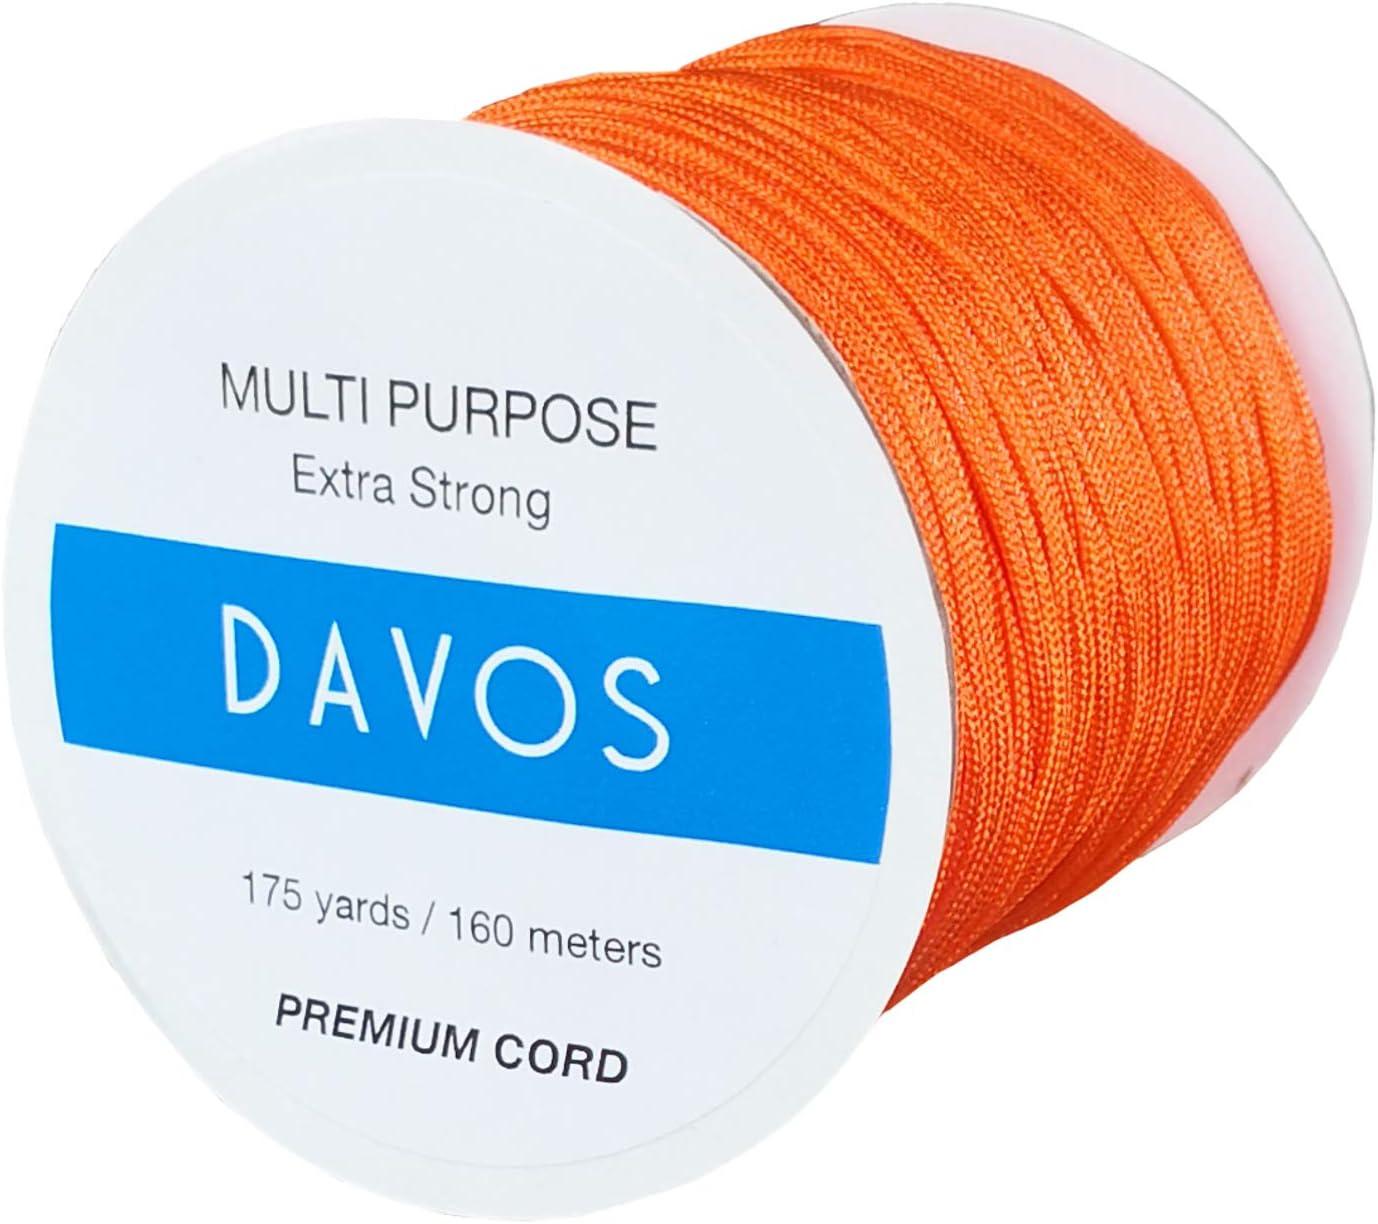 Pumpkin Orange Nylon Braided Cord Thread 1.5mm x 175 Yards for Jewelry Making String Beading Shamballa Necklaces Bracelets Lift Shade Cord Window Blind Arts Crafts DIY Extra Strong